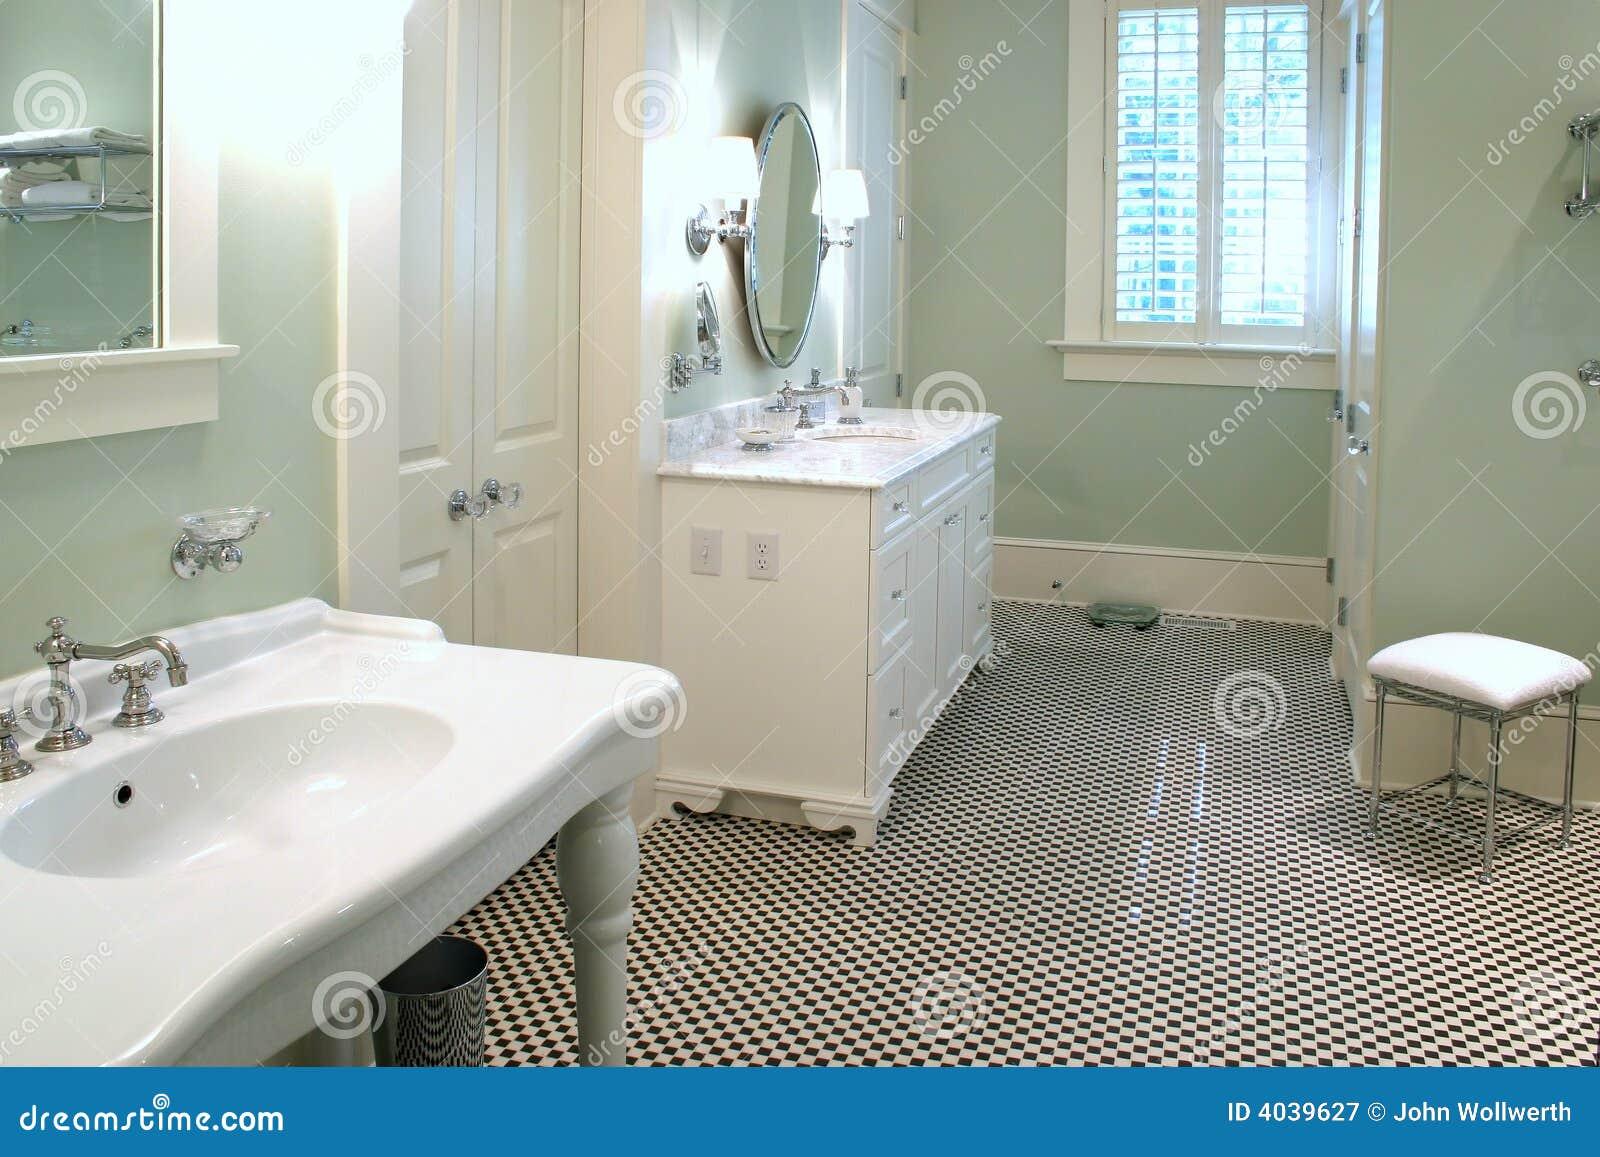 Banheiro Preto E Branco Luxuoso Fotografia de Stock Royalty Free  #82A328 1300 957